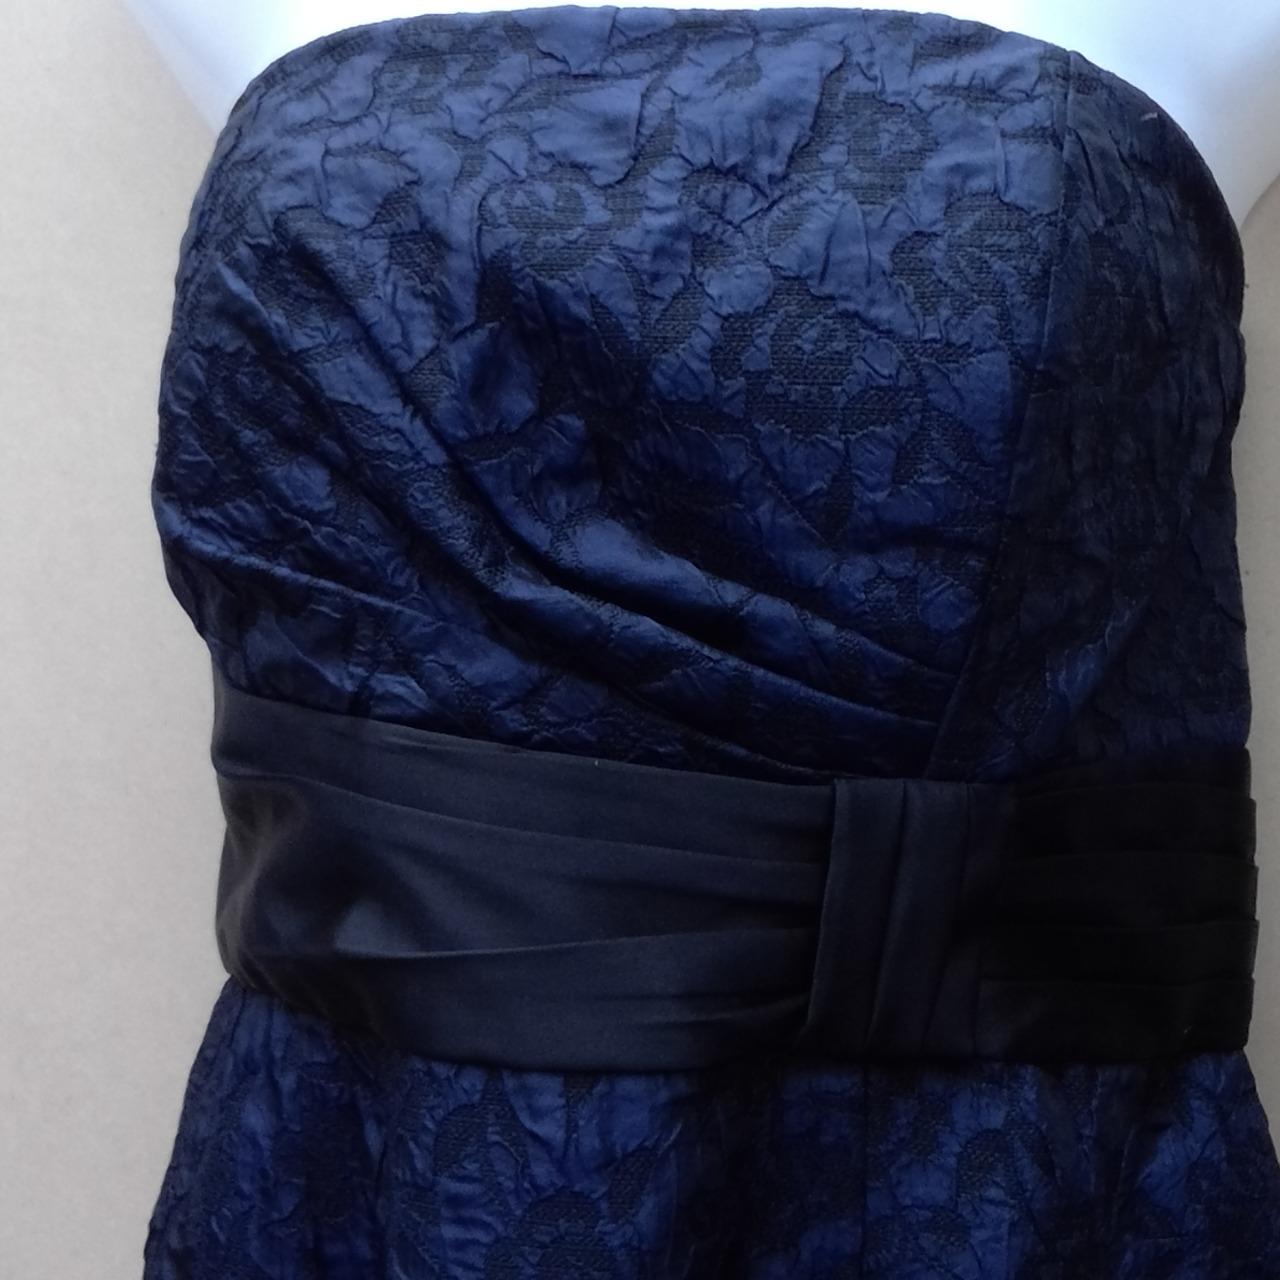 Womens TABLE EIGHT 2PCE  STRAPLESS DRESS &BOLERO JACKET Blue /Black Lace Size 14 Formal Dress/Cocktail Dress/Midi Dress